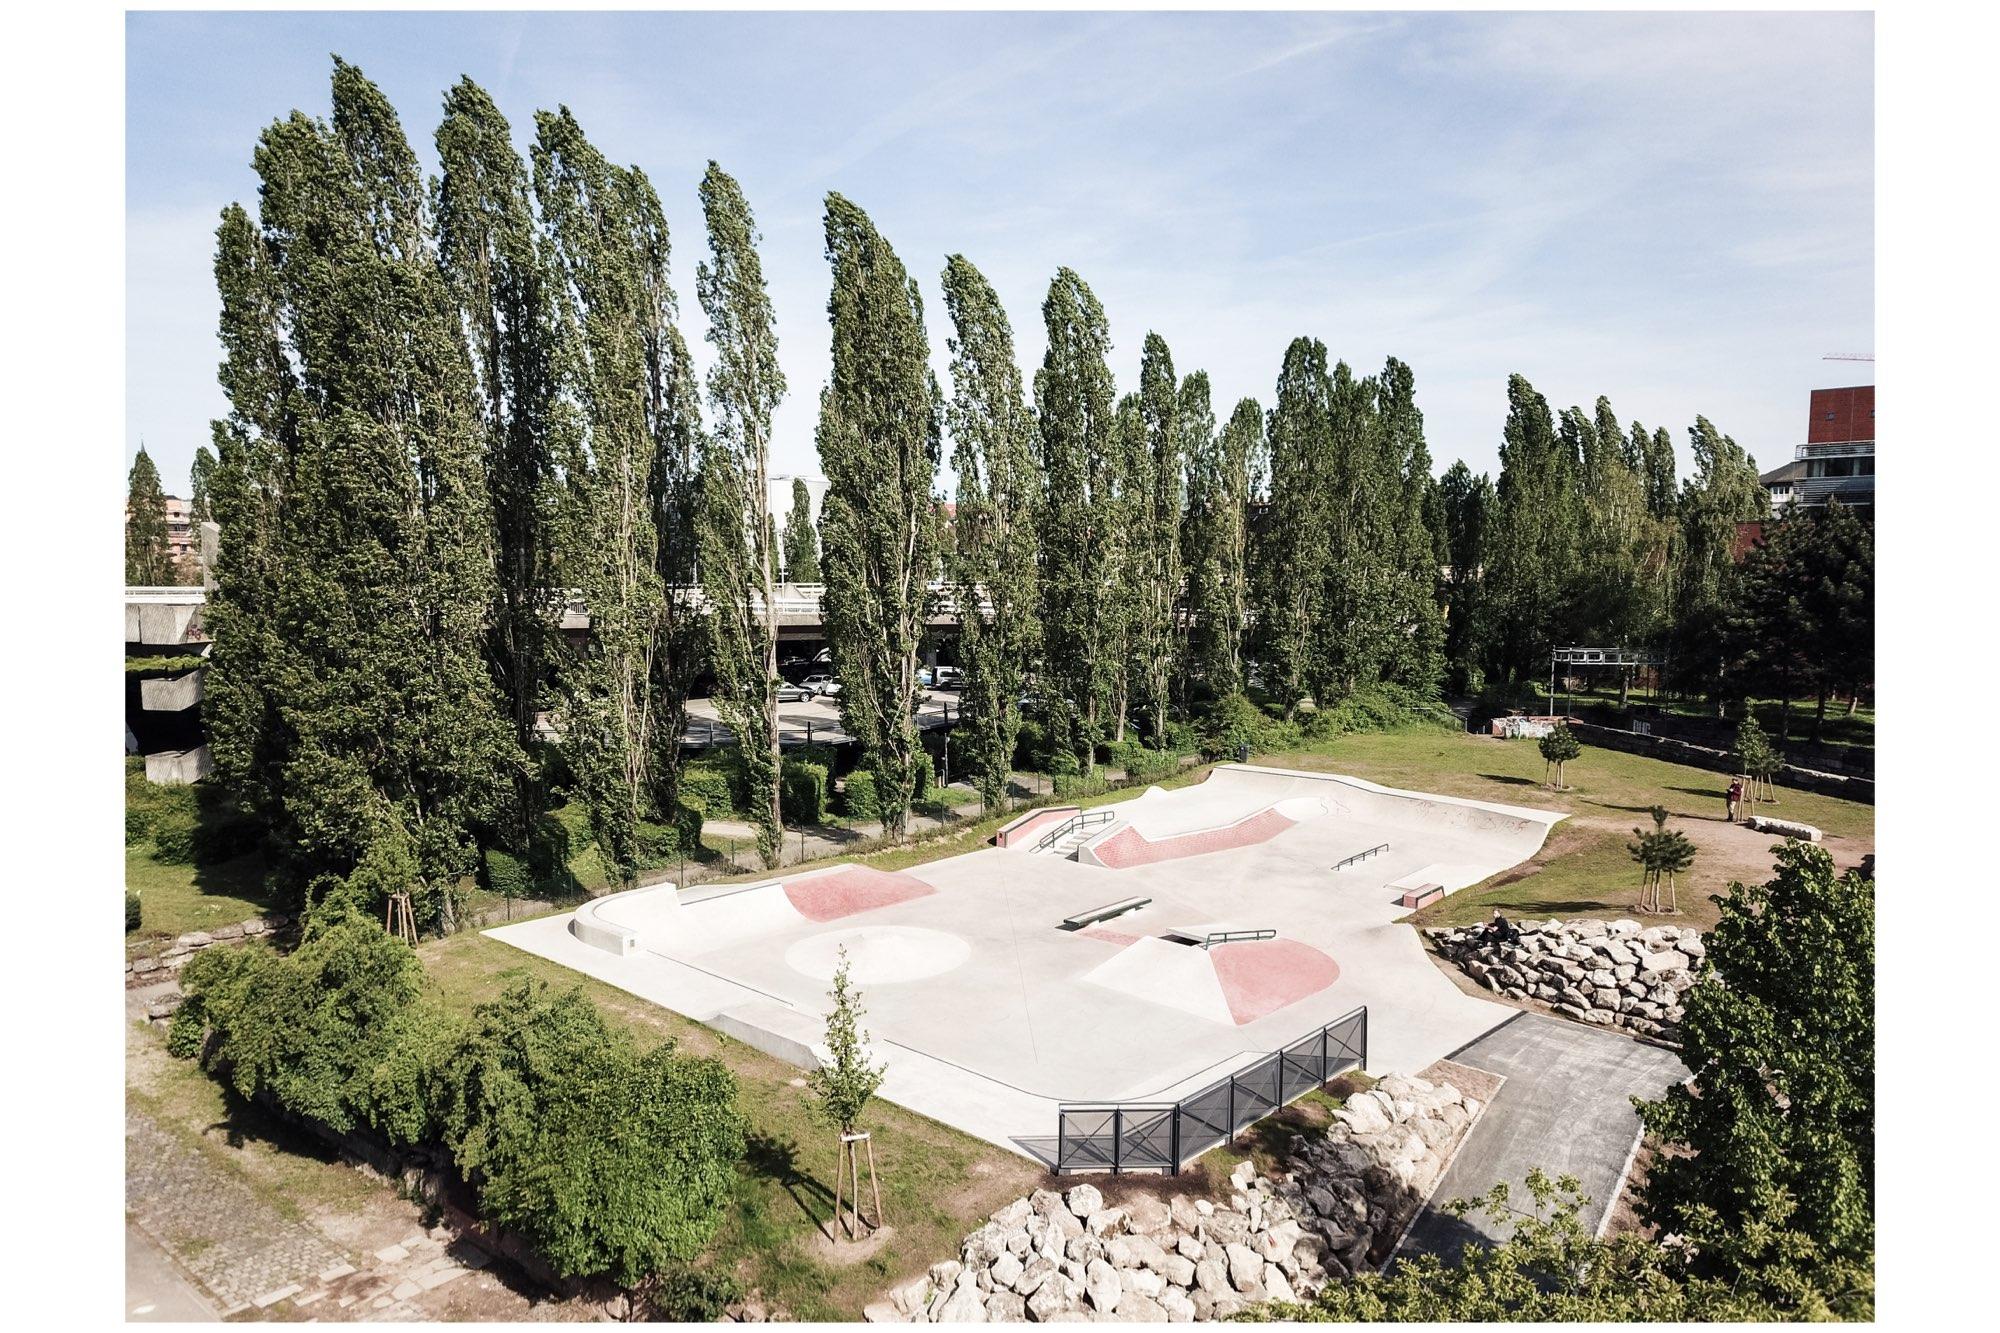 landskate_skatepark_planung_saarbrcken_lndskt